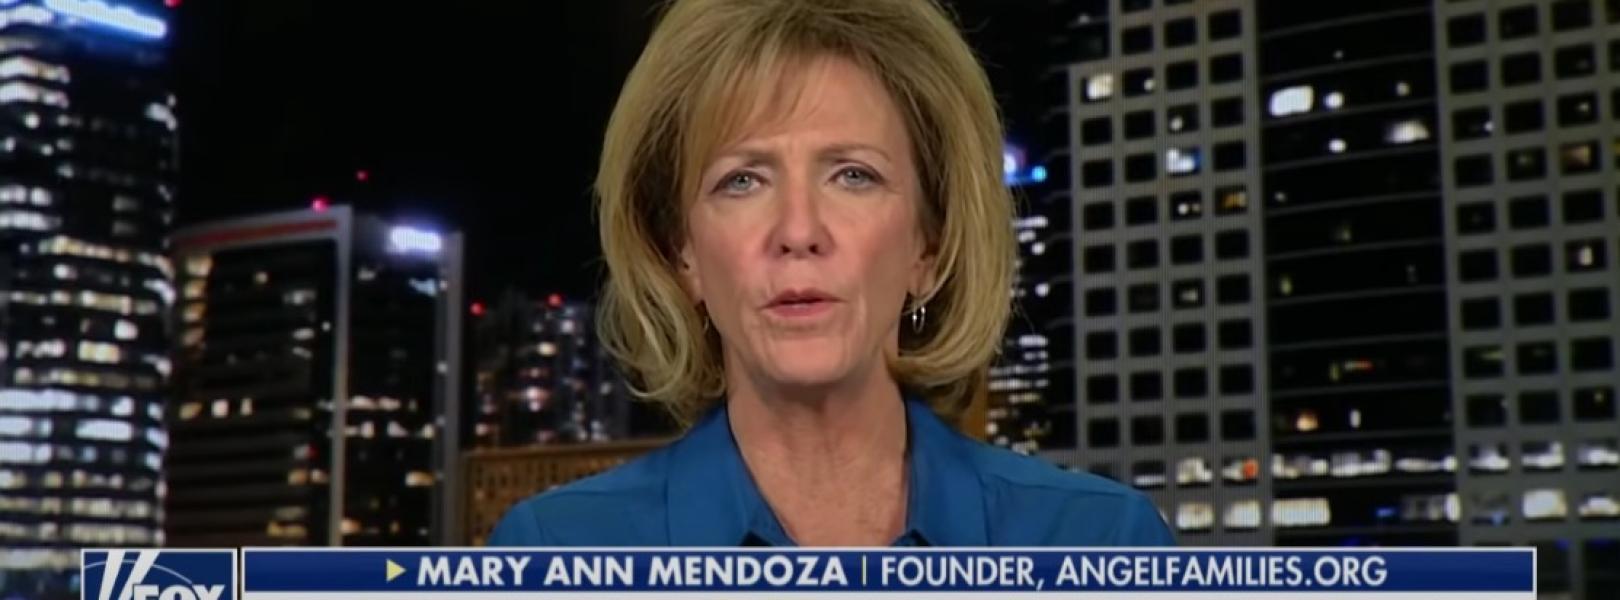 Mary Ann Mendoza Fox News